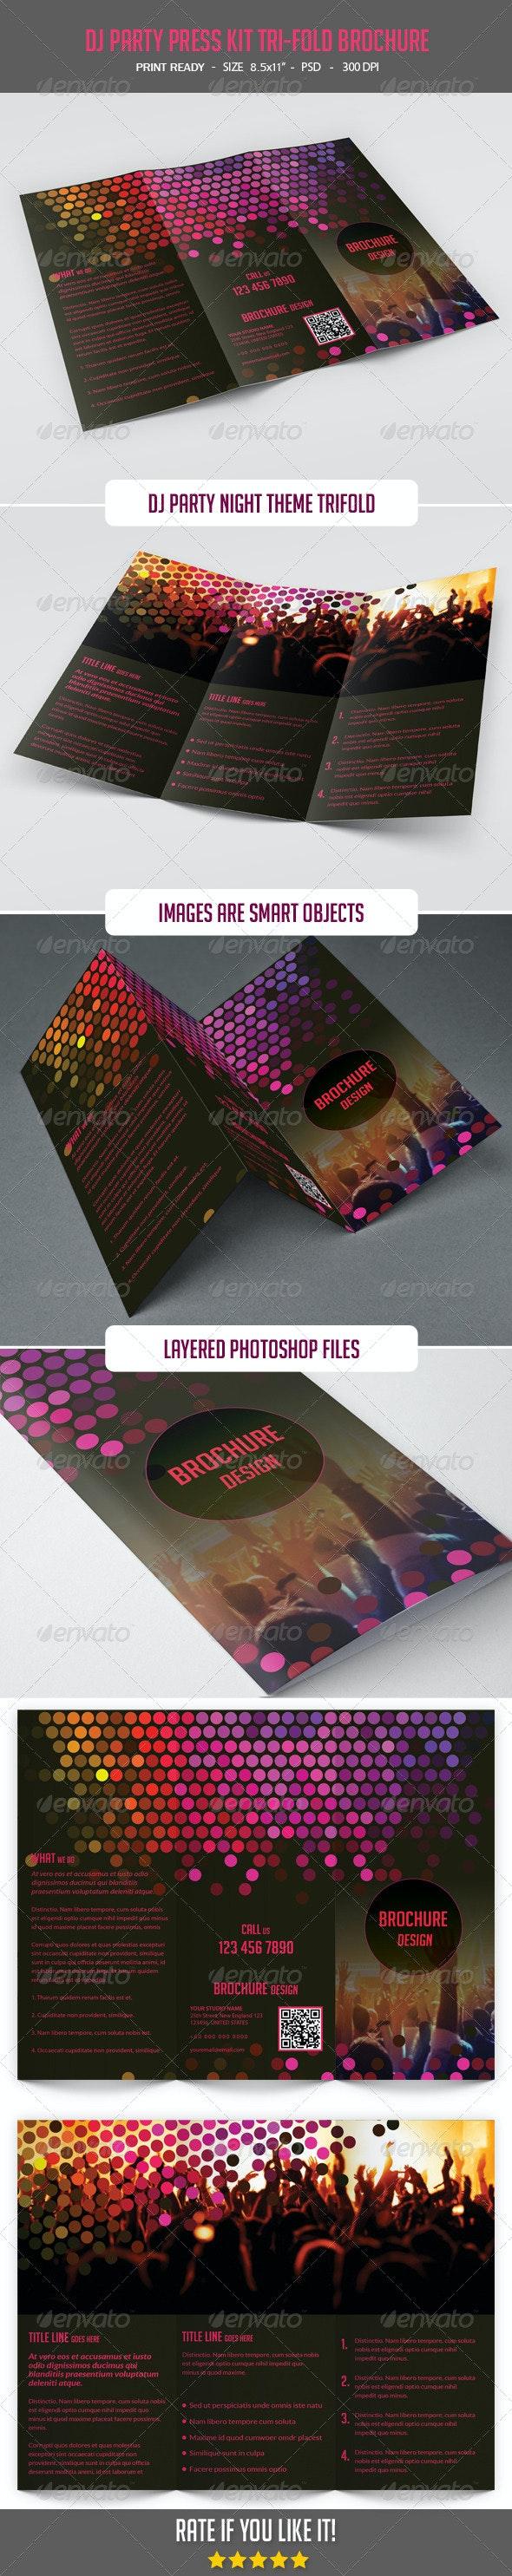 DJ Party Press Kit Tri-Fold Brochure - Brochures Print Templates